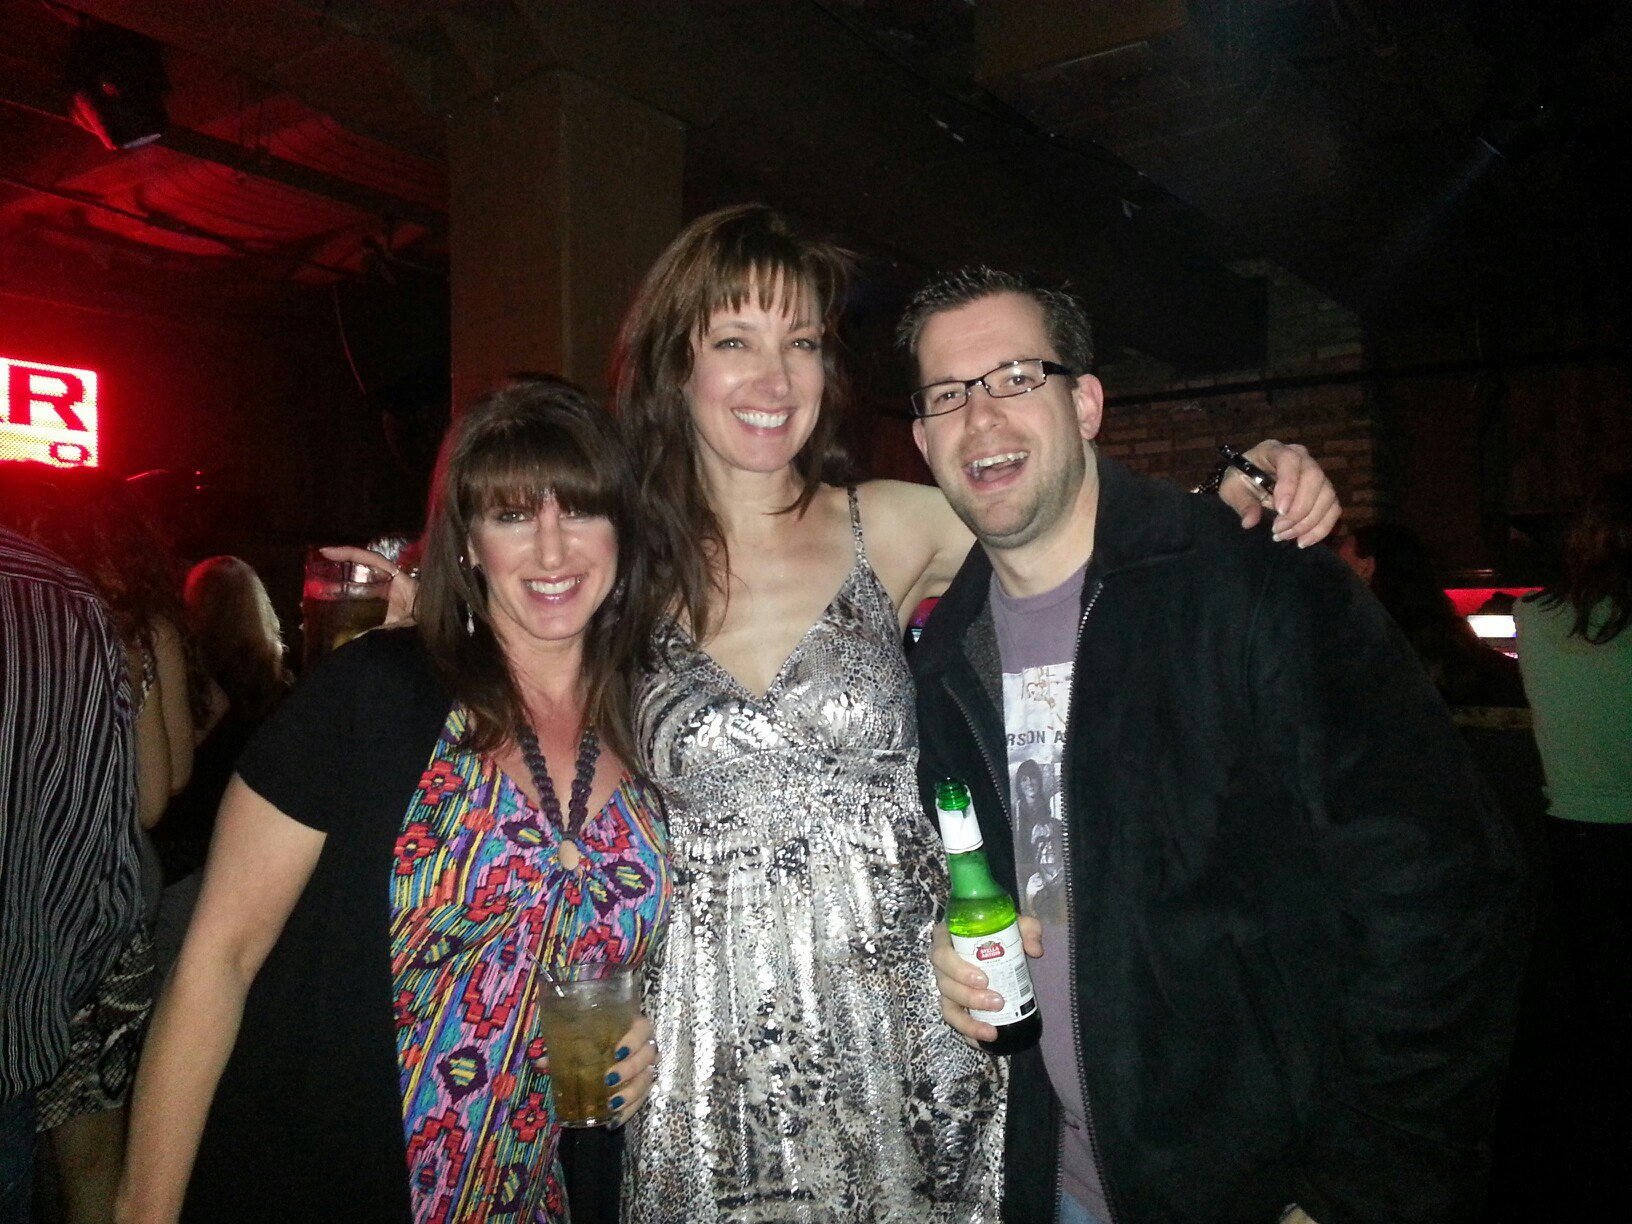 Another reunion with radio friends! (Cara Carriveau & Sandy Maxx)